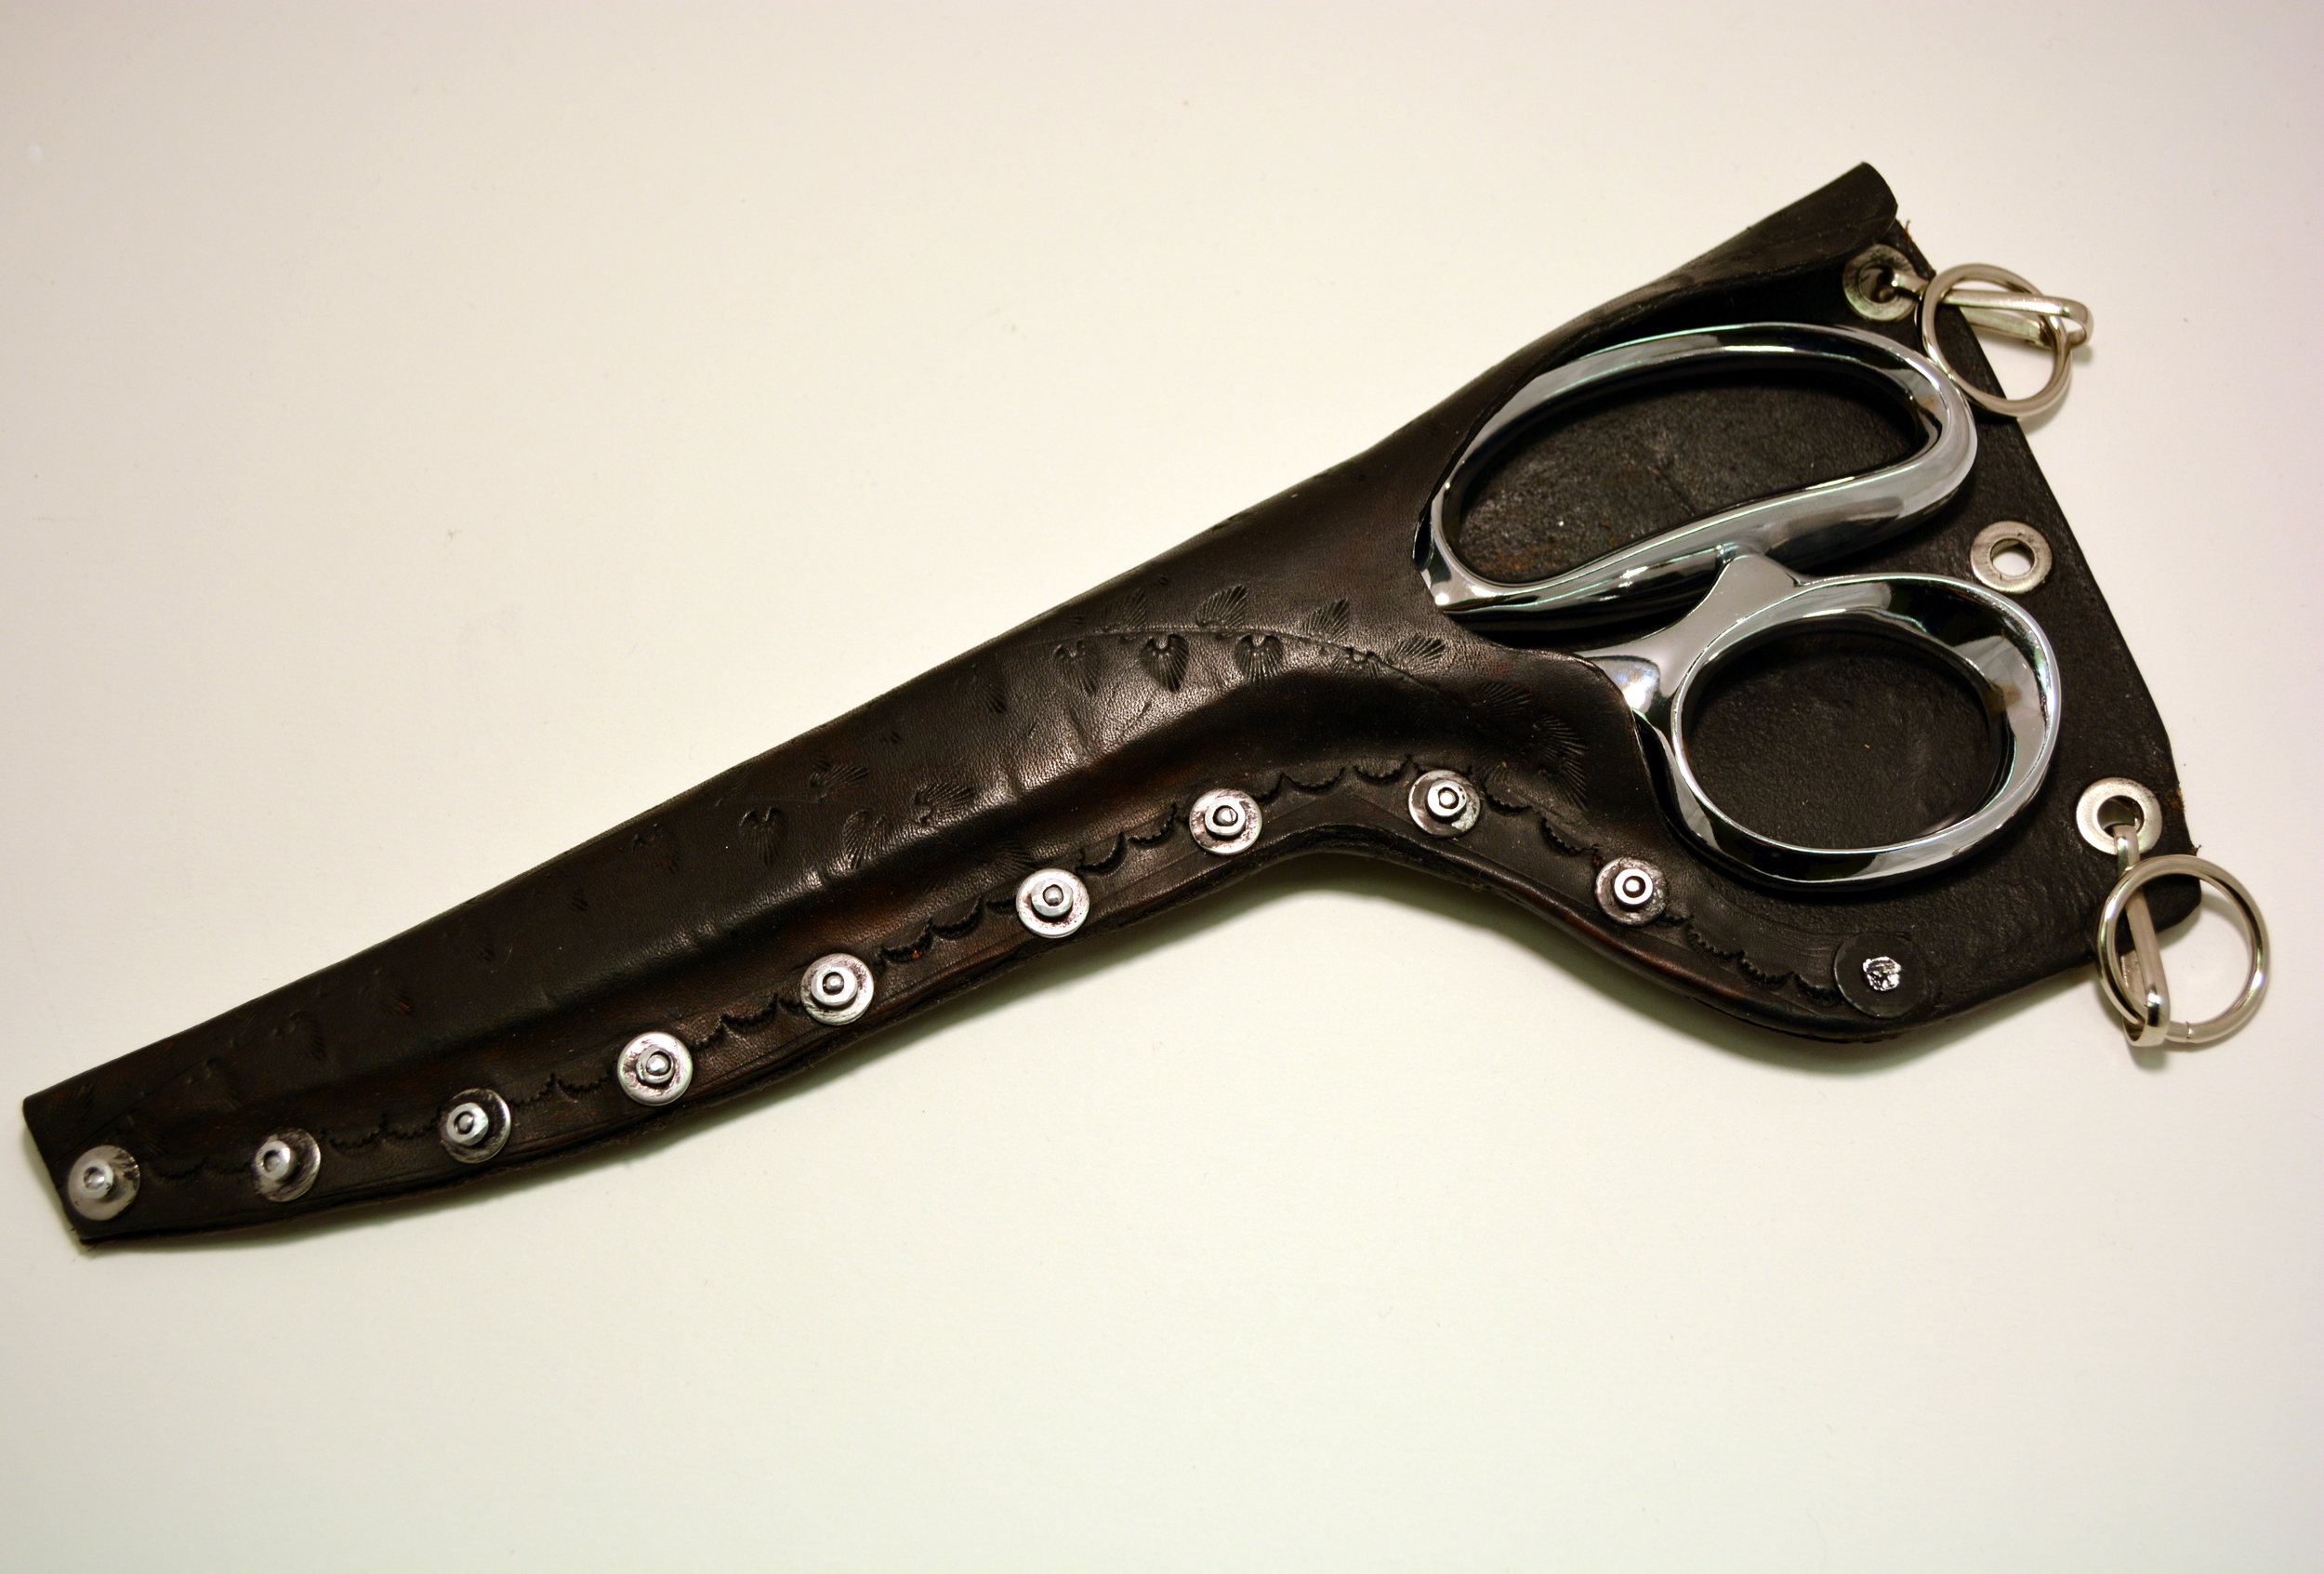 gingher fabric shears